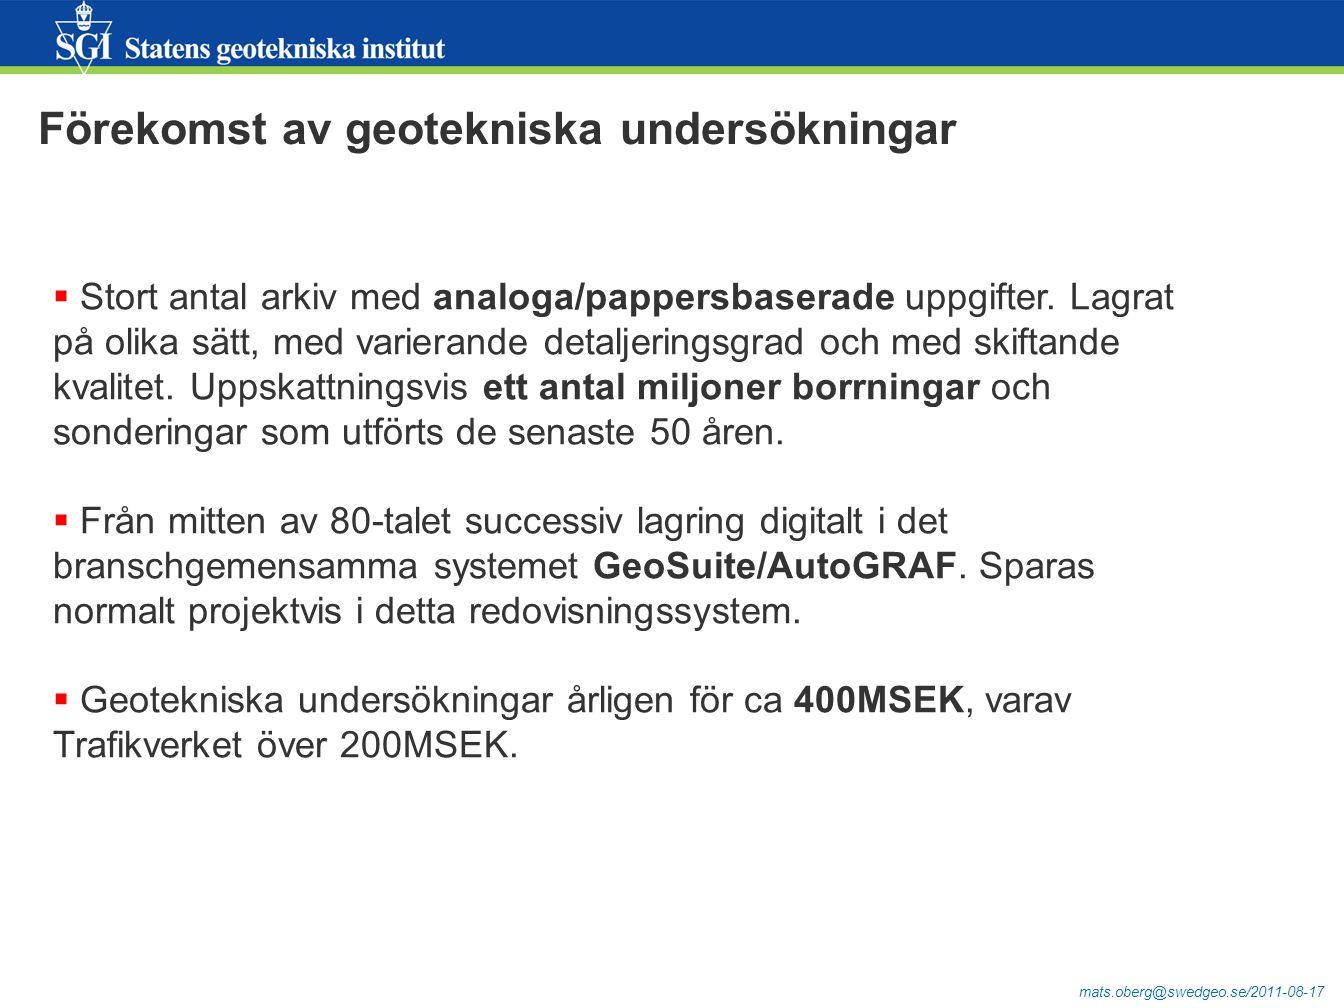 mats.oberg@swedgeo.se/2011-08-17 Exempel på analoga lagrade undersökningar (arkivmtrl) SGU lagerföljder